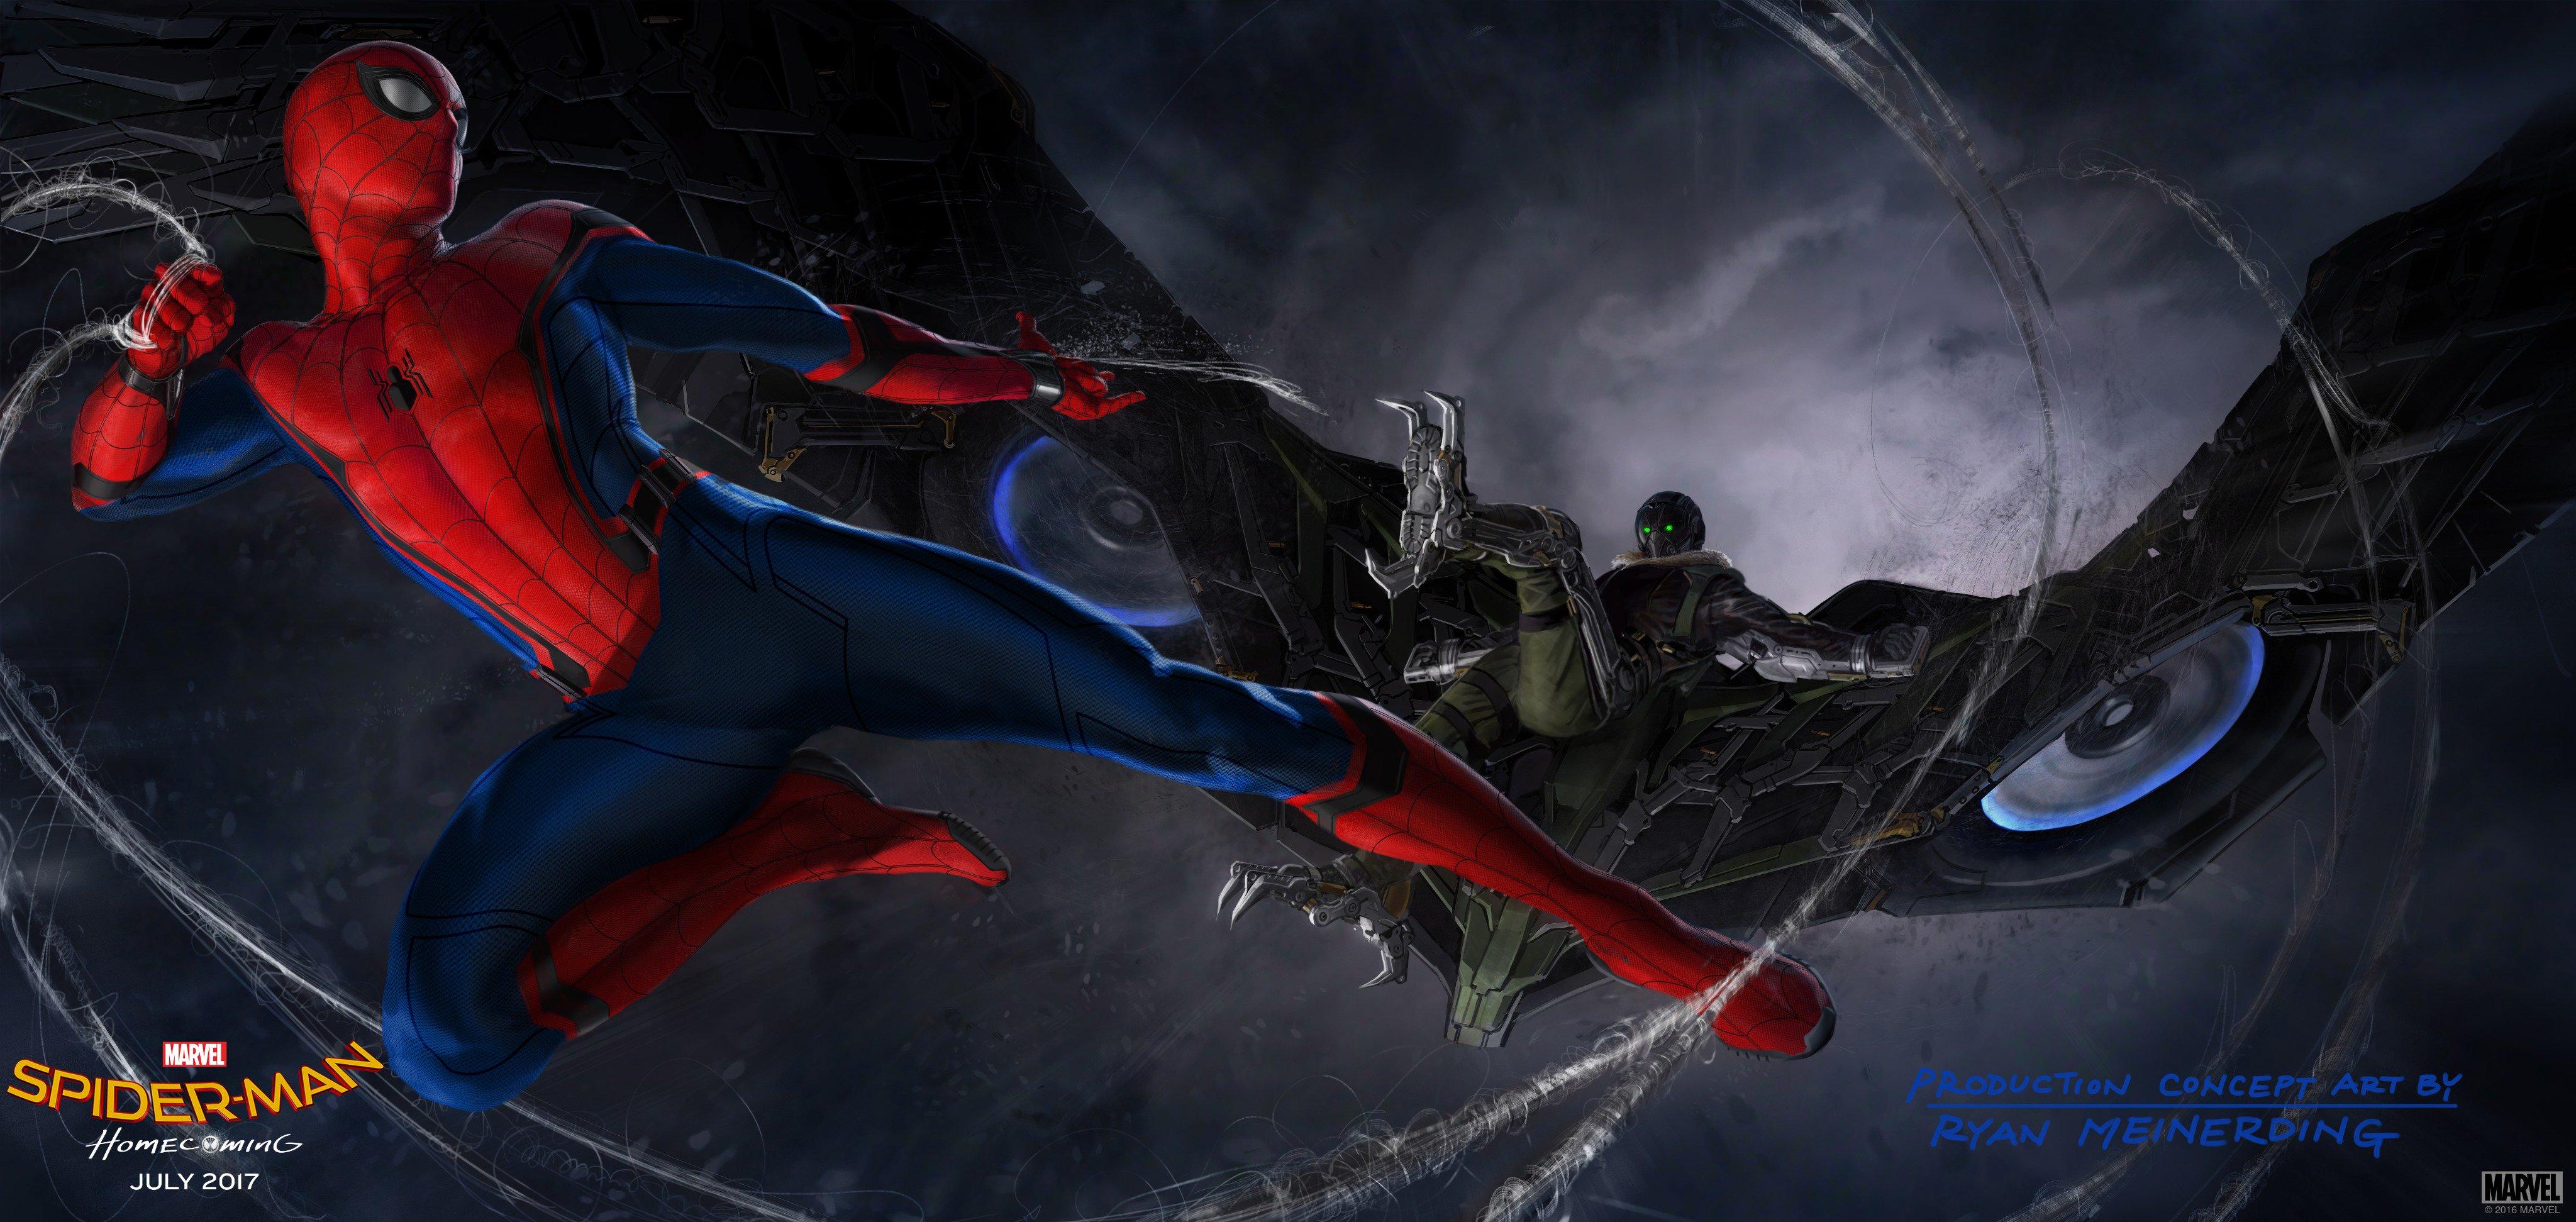 Download <b>Spiderman</b> PS4 2016 Game HD 4k <b>Wallpapers</b> In <b>2560x1080</b> ...